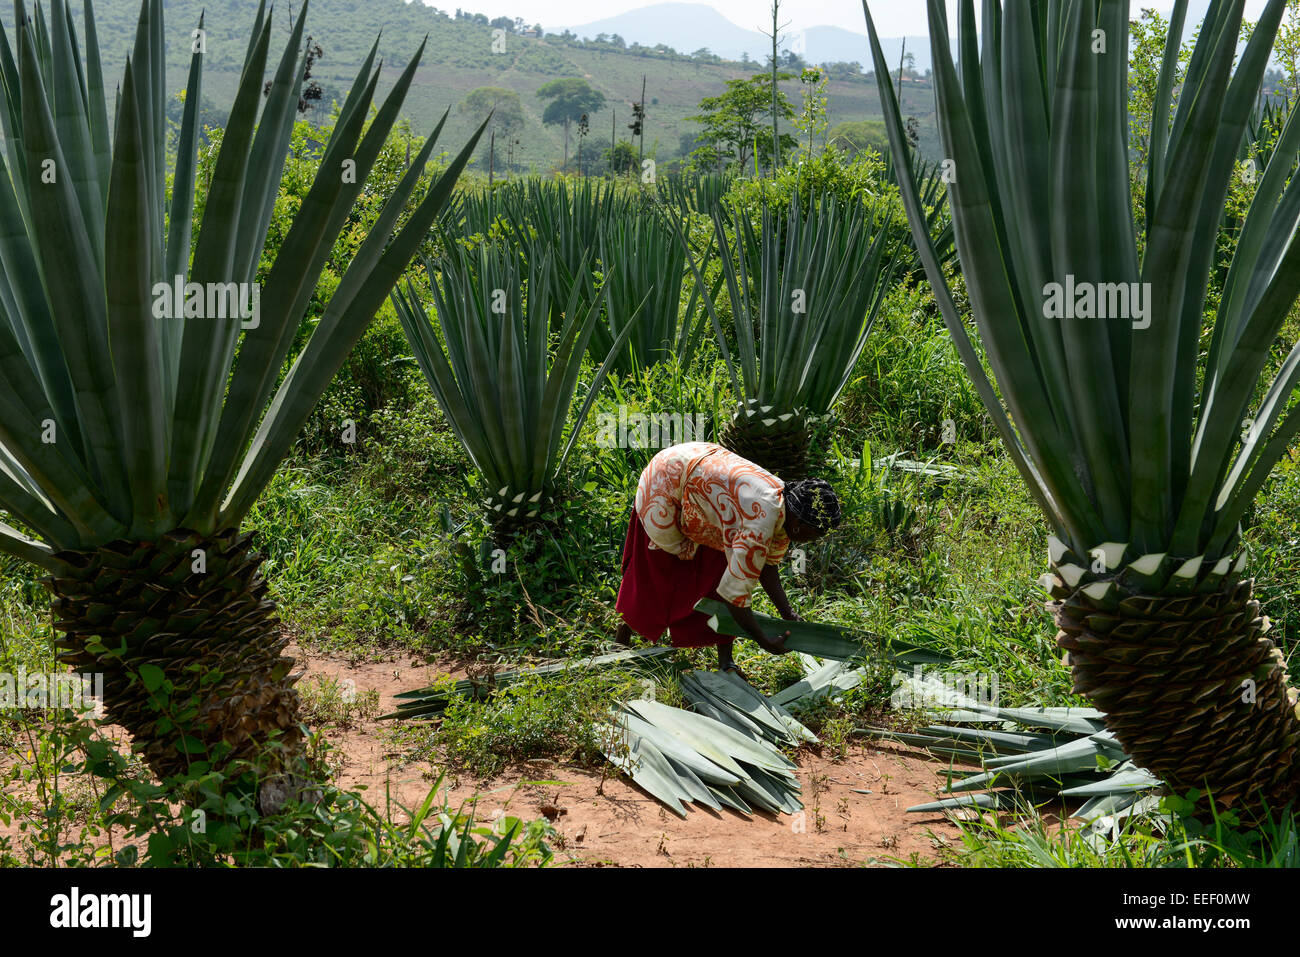 Tansania, Tanga, Korogwe, Sisal-Plantage in Kwalukonge, Bauernhof Arbeiter Ernte Sisal-Blätter, die für Stockbild